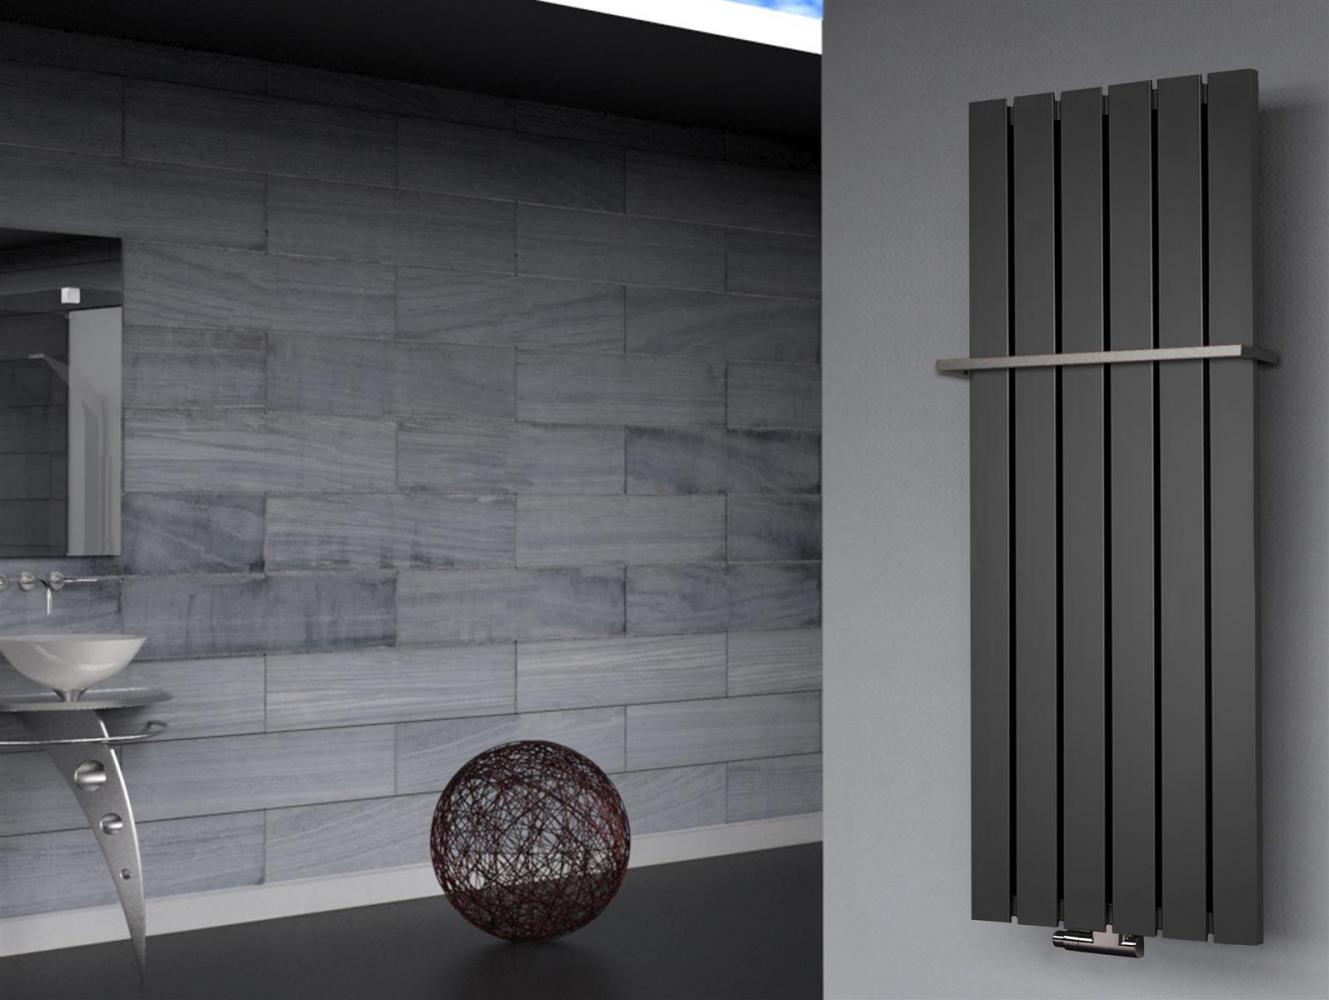 Full Size of Bad Heizkörper Handtuchhalter Badezimmer Elektroheizkörper Wohnzimmer Küche Für Wohnzimmer Handtuchhalter Heizkörper